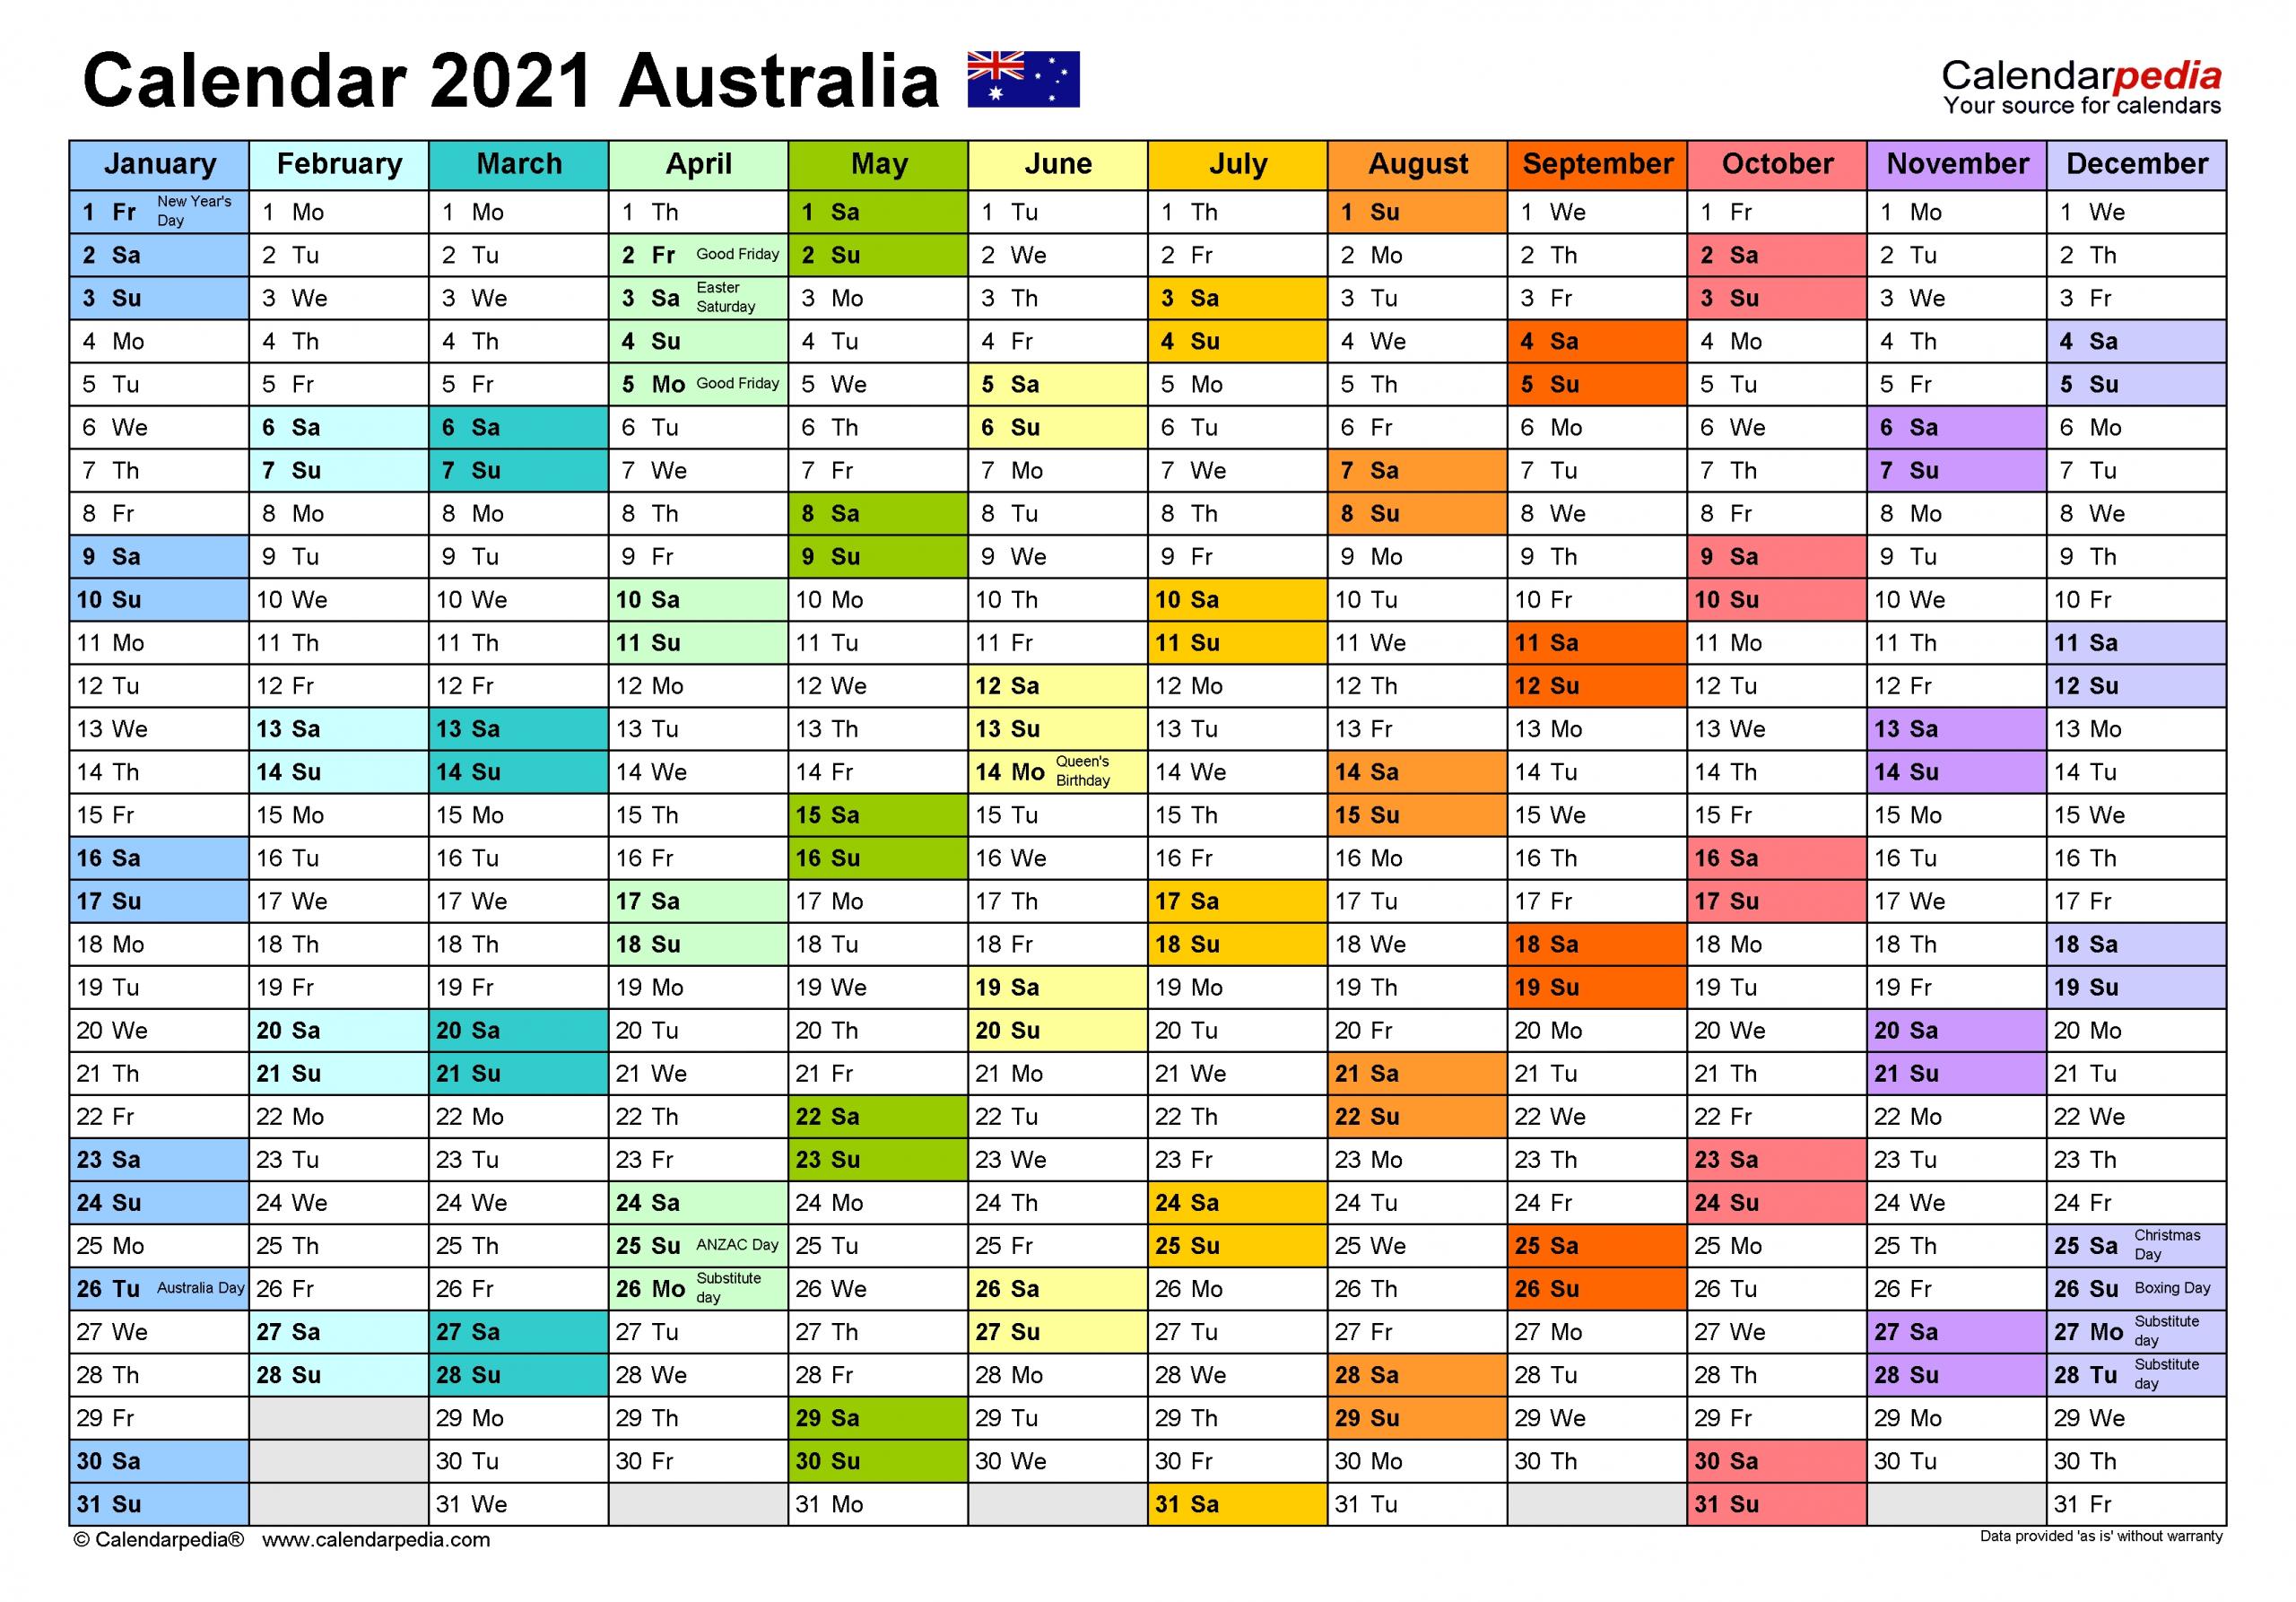 Take Calendar 2021 Australia